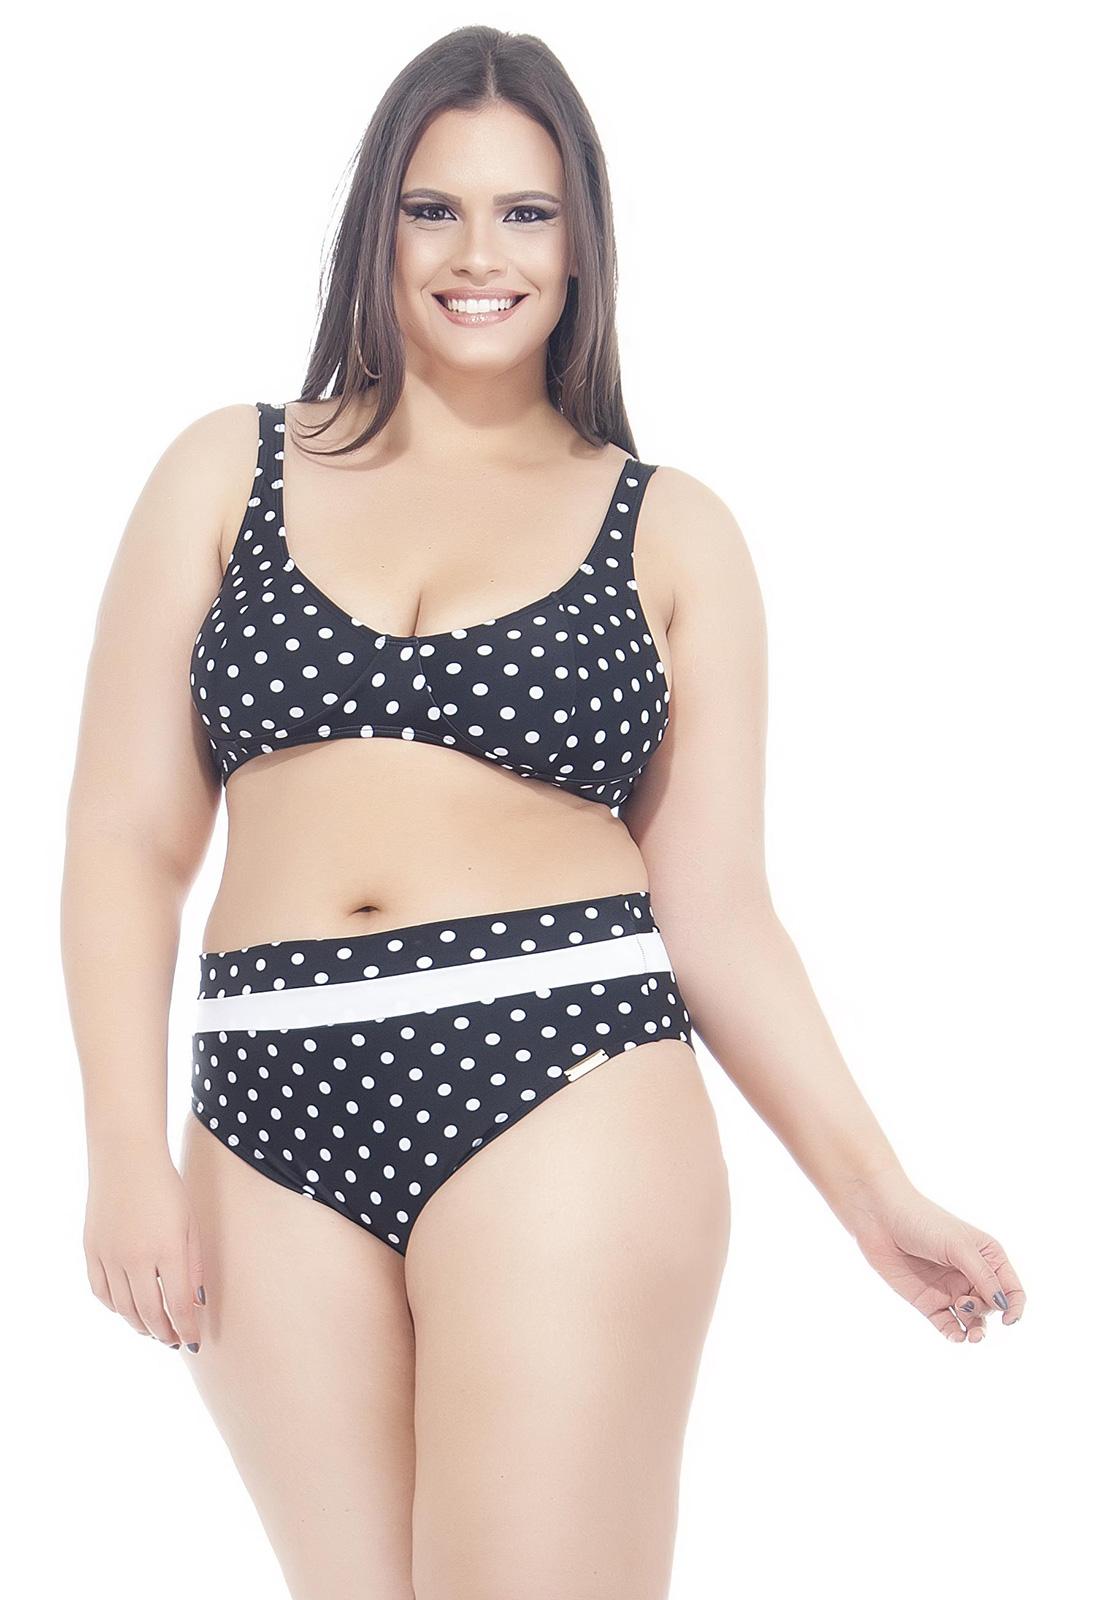 Where Retro polka dot bikini consider